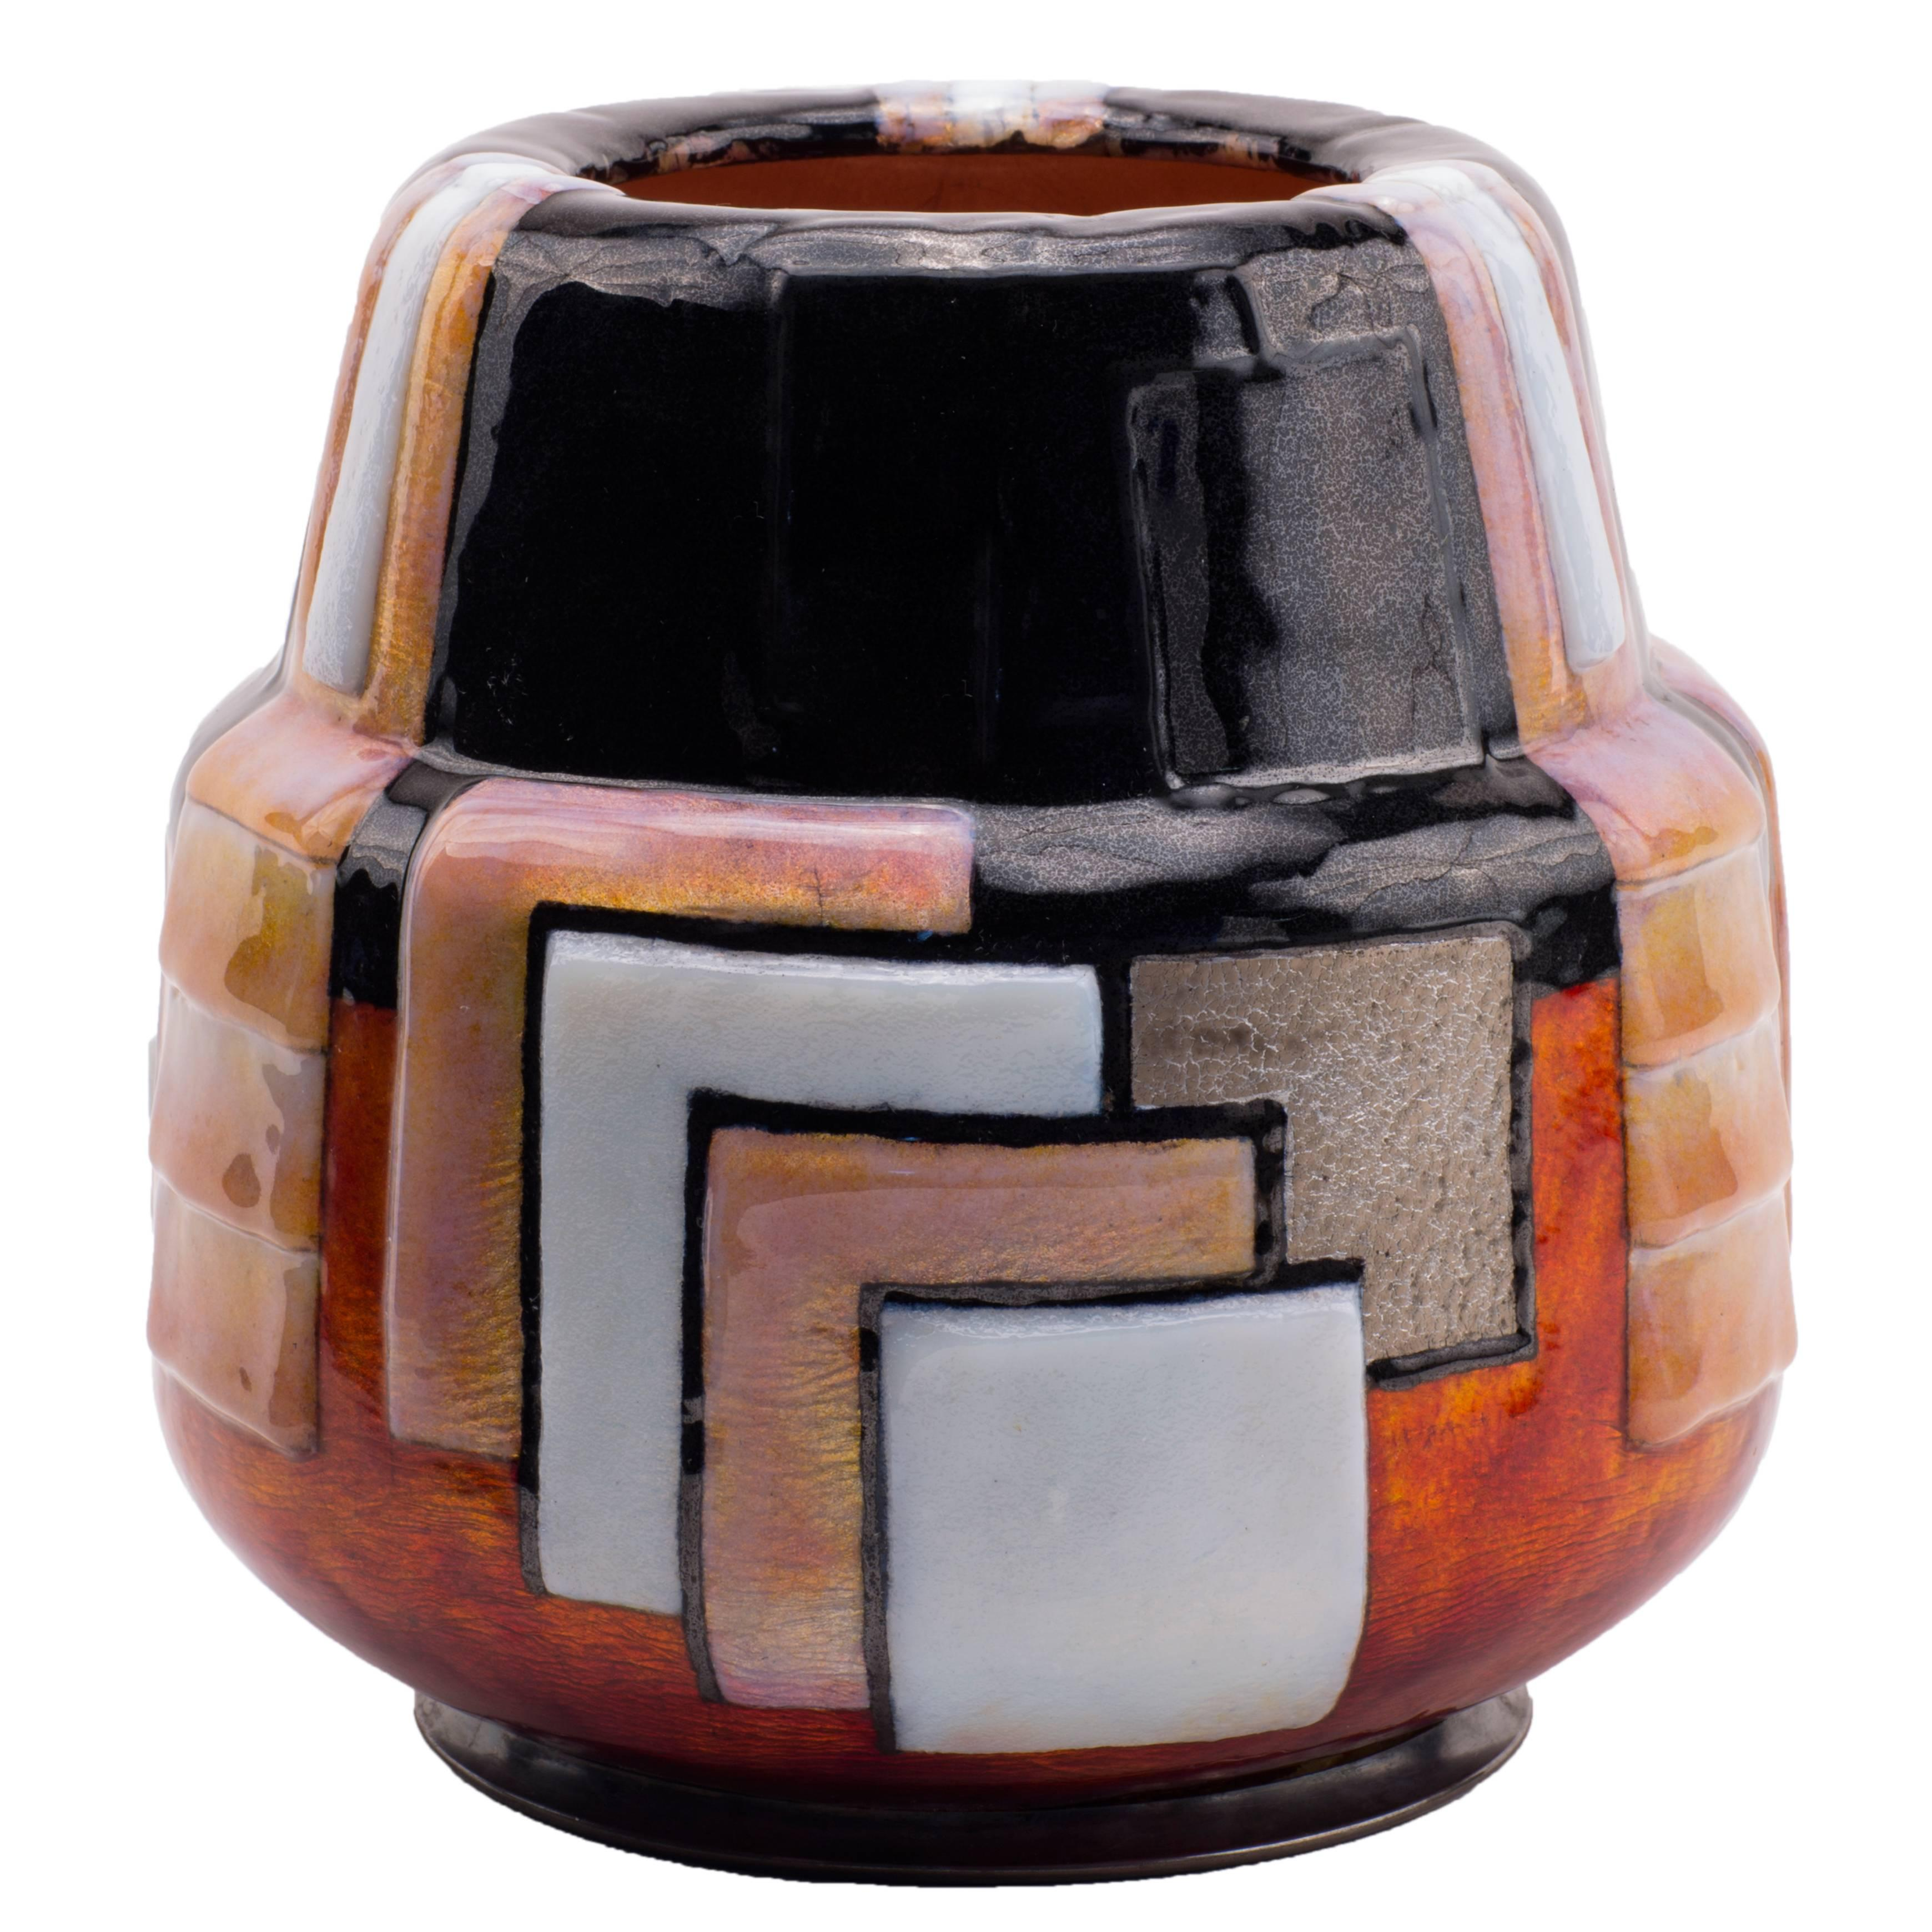 Art Deco Geometric Enameled Vase by, Camille Fauré